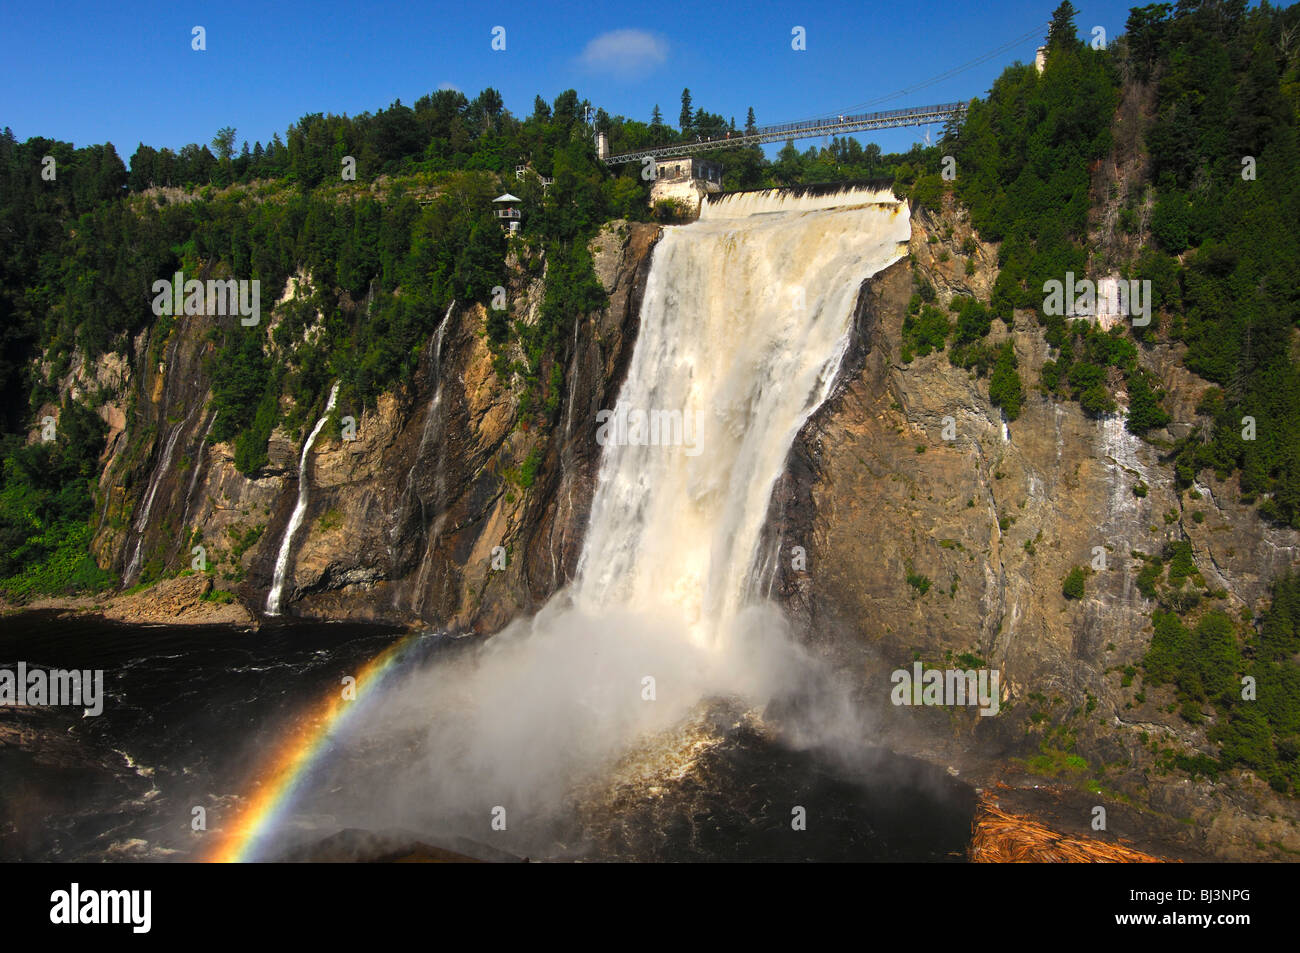 Naturschauspiel Montmorency Falls, Beauport, Quebec, Kanada Stockfoto